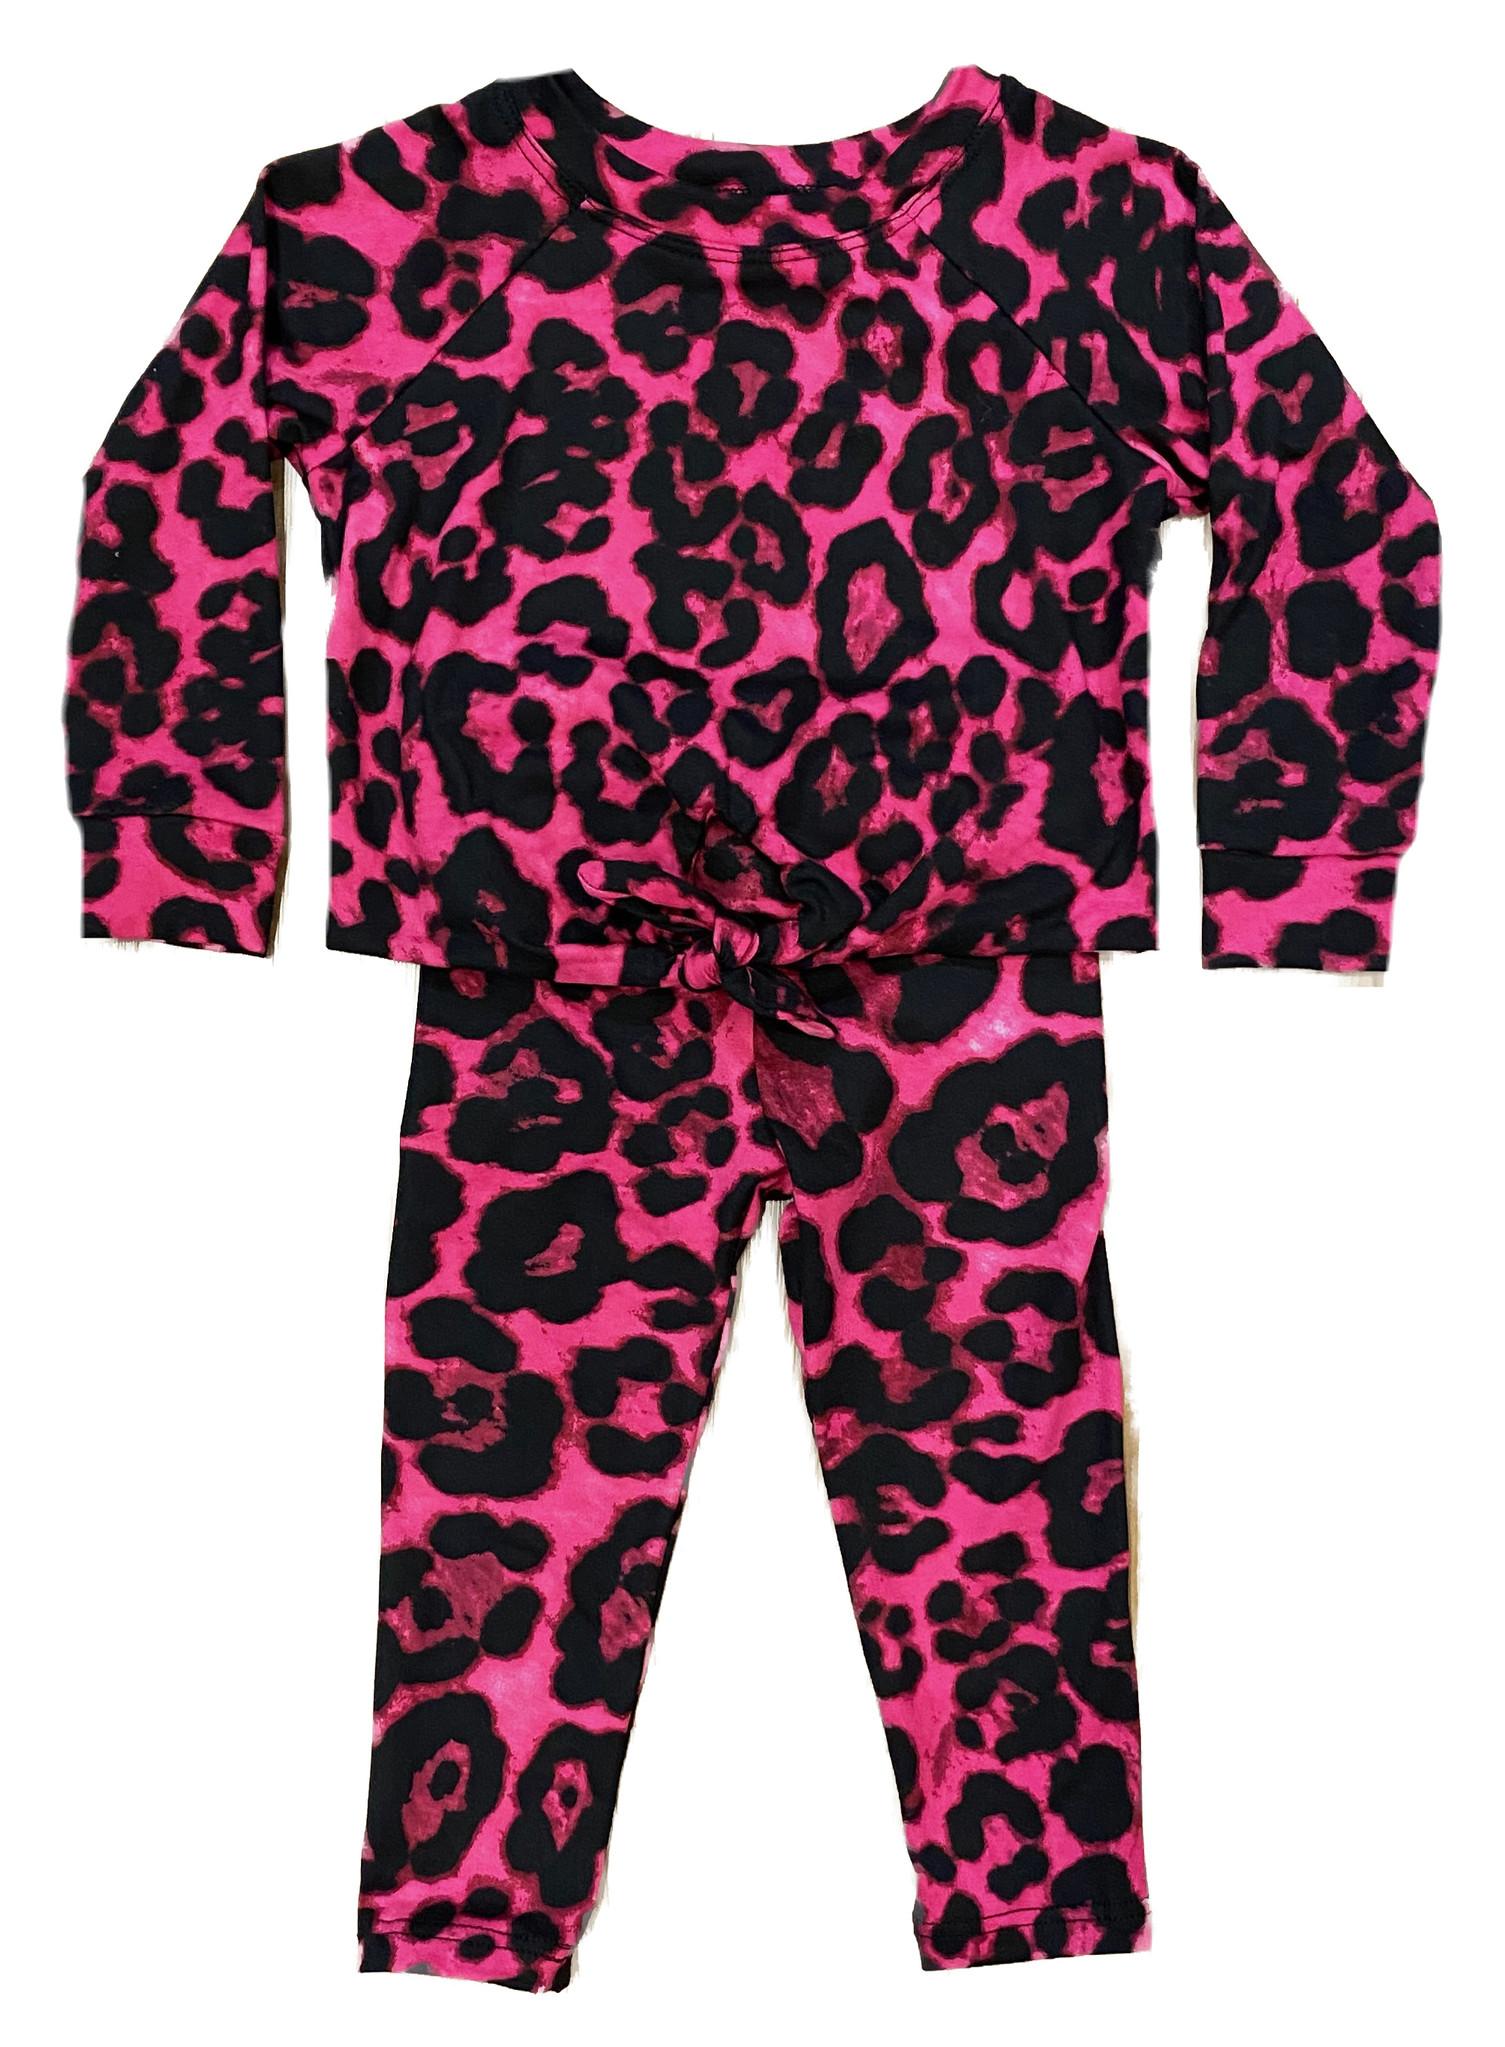 Sofi Fuschia Leopard Knotted Legging Set